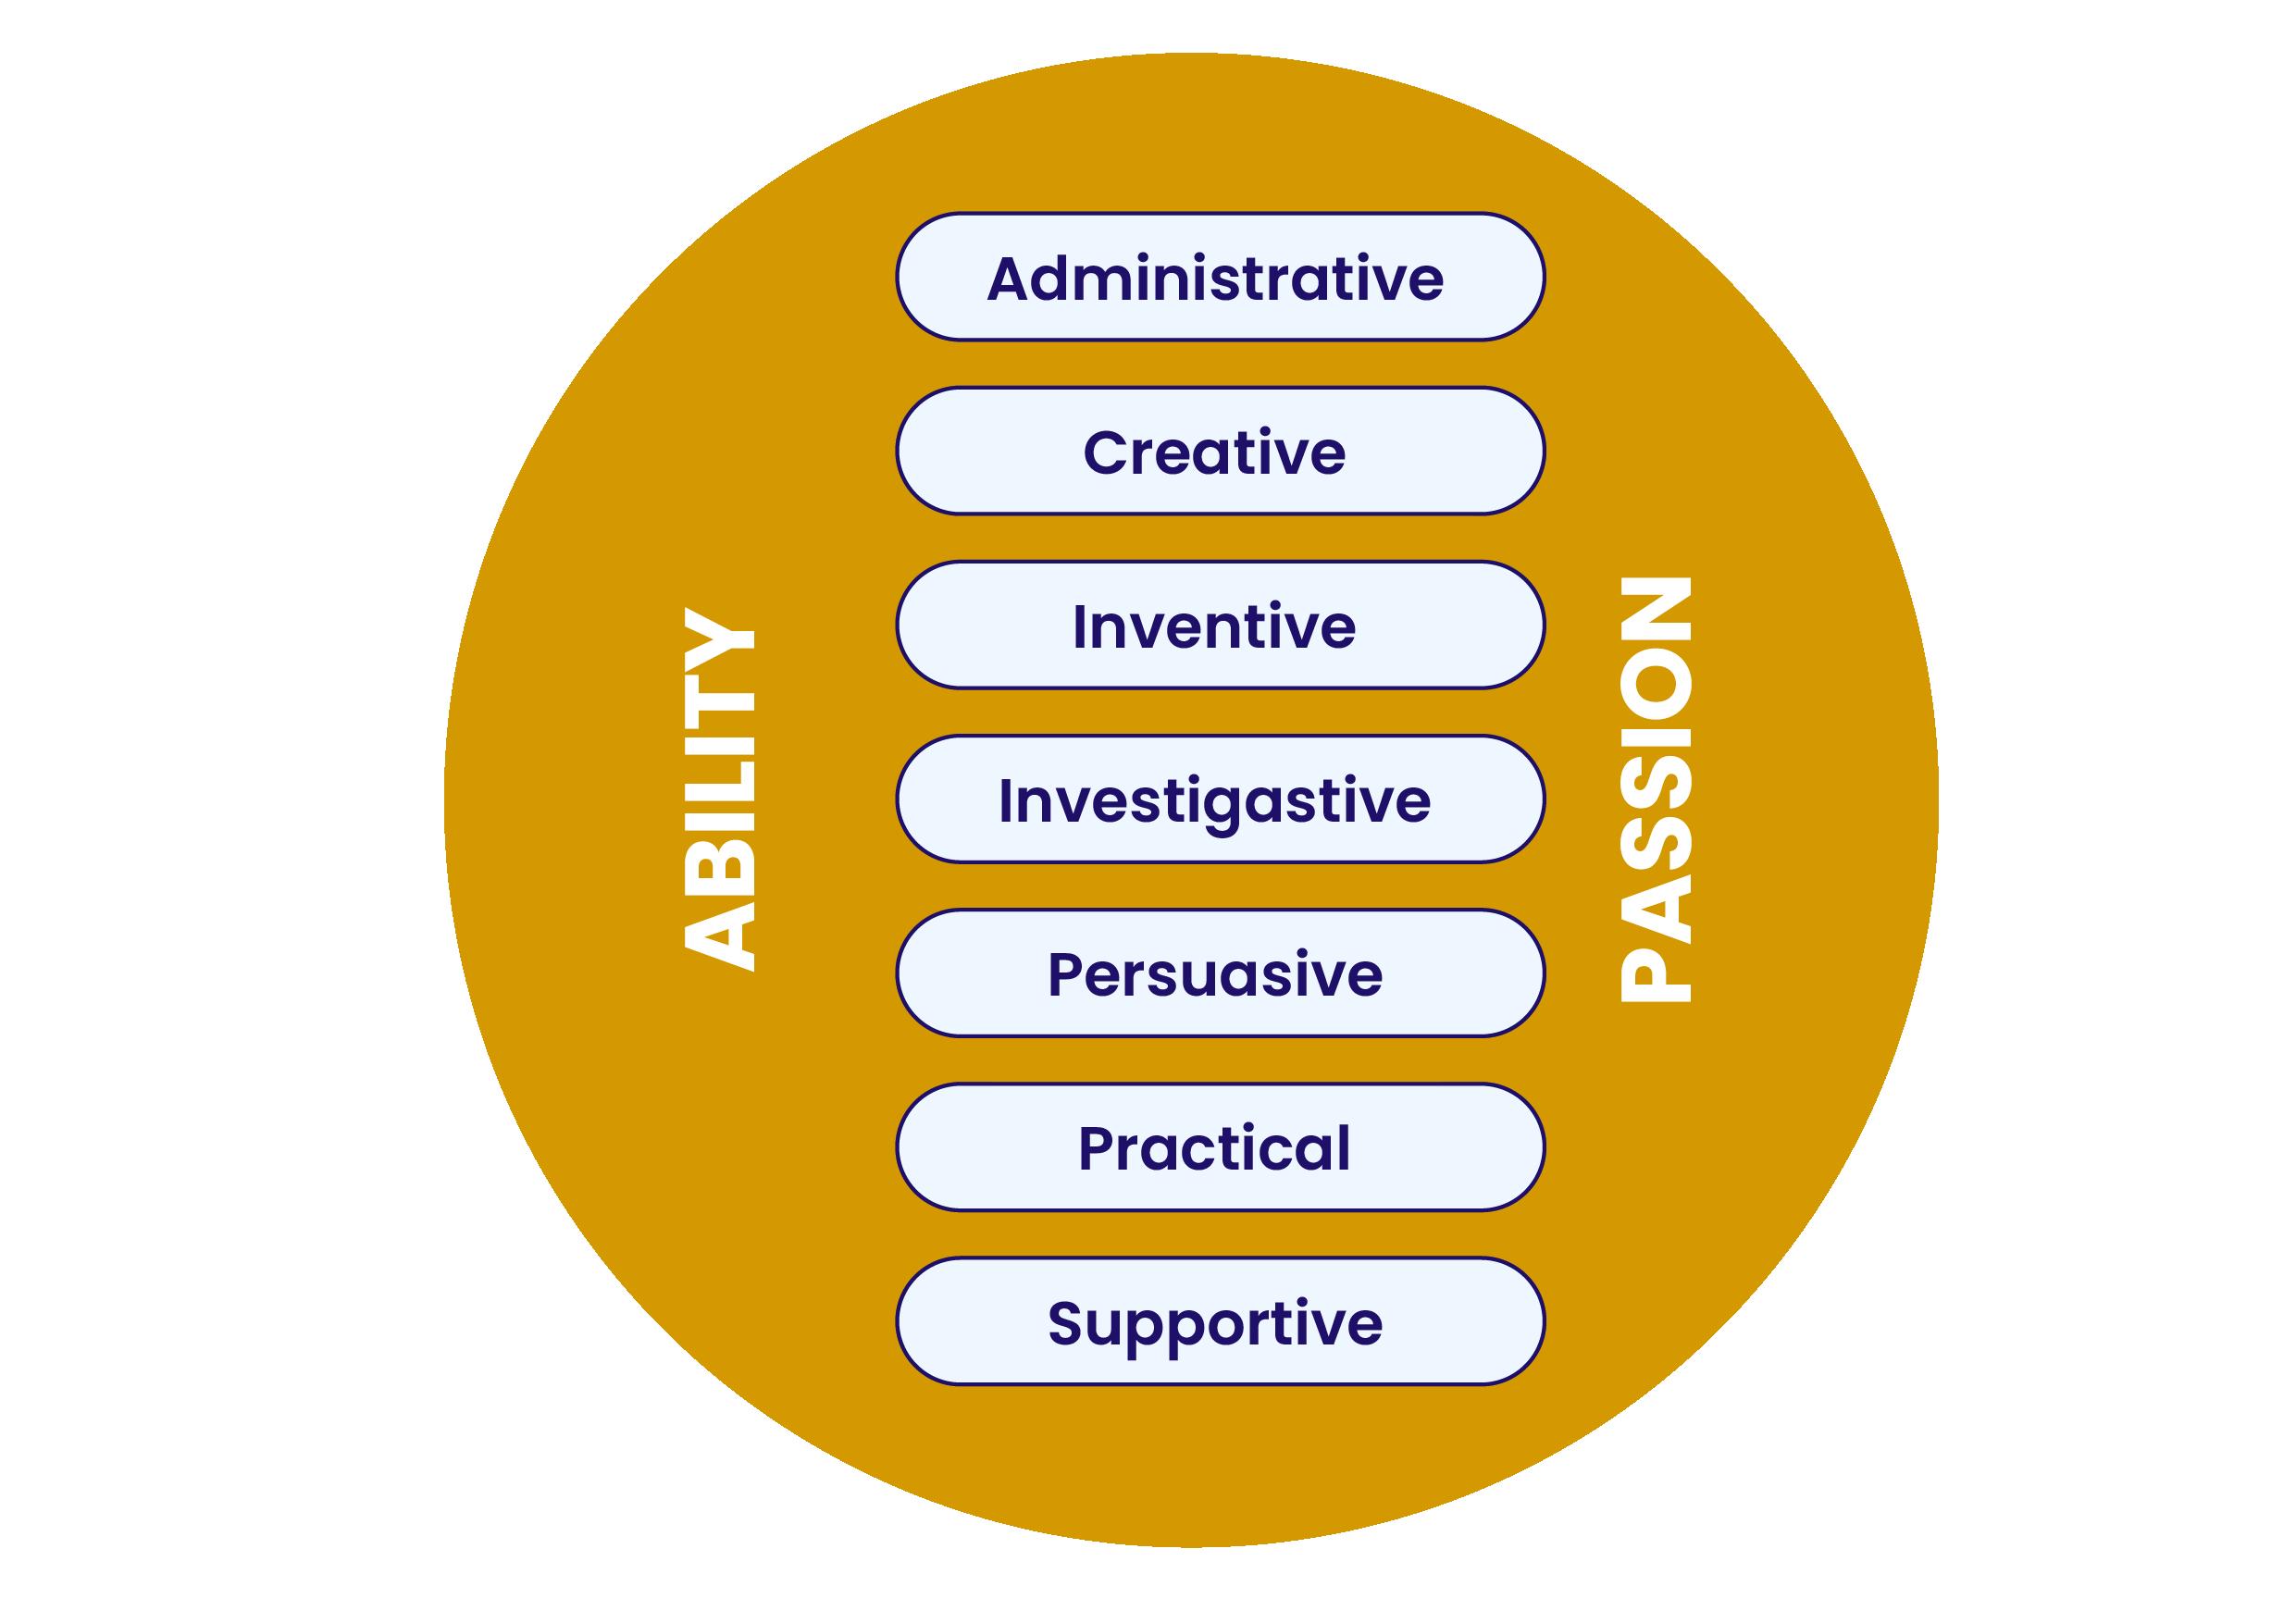 https://iassessonline.com/wp-content/uploads/2021/03/Passion-Ability.png